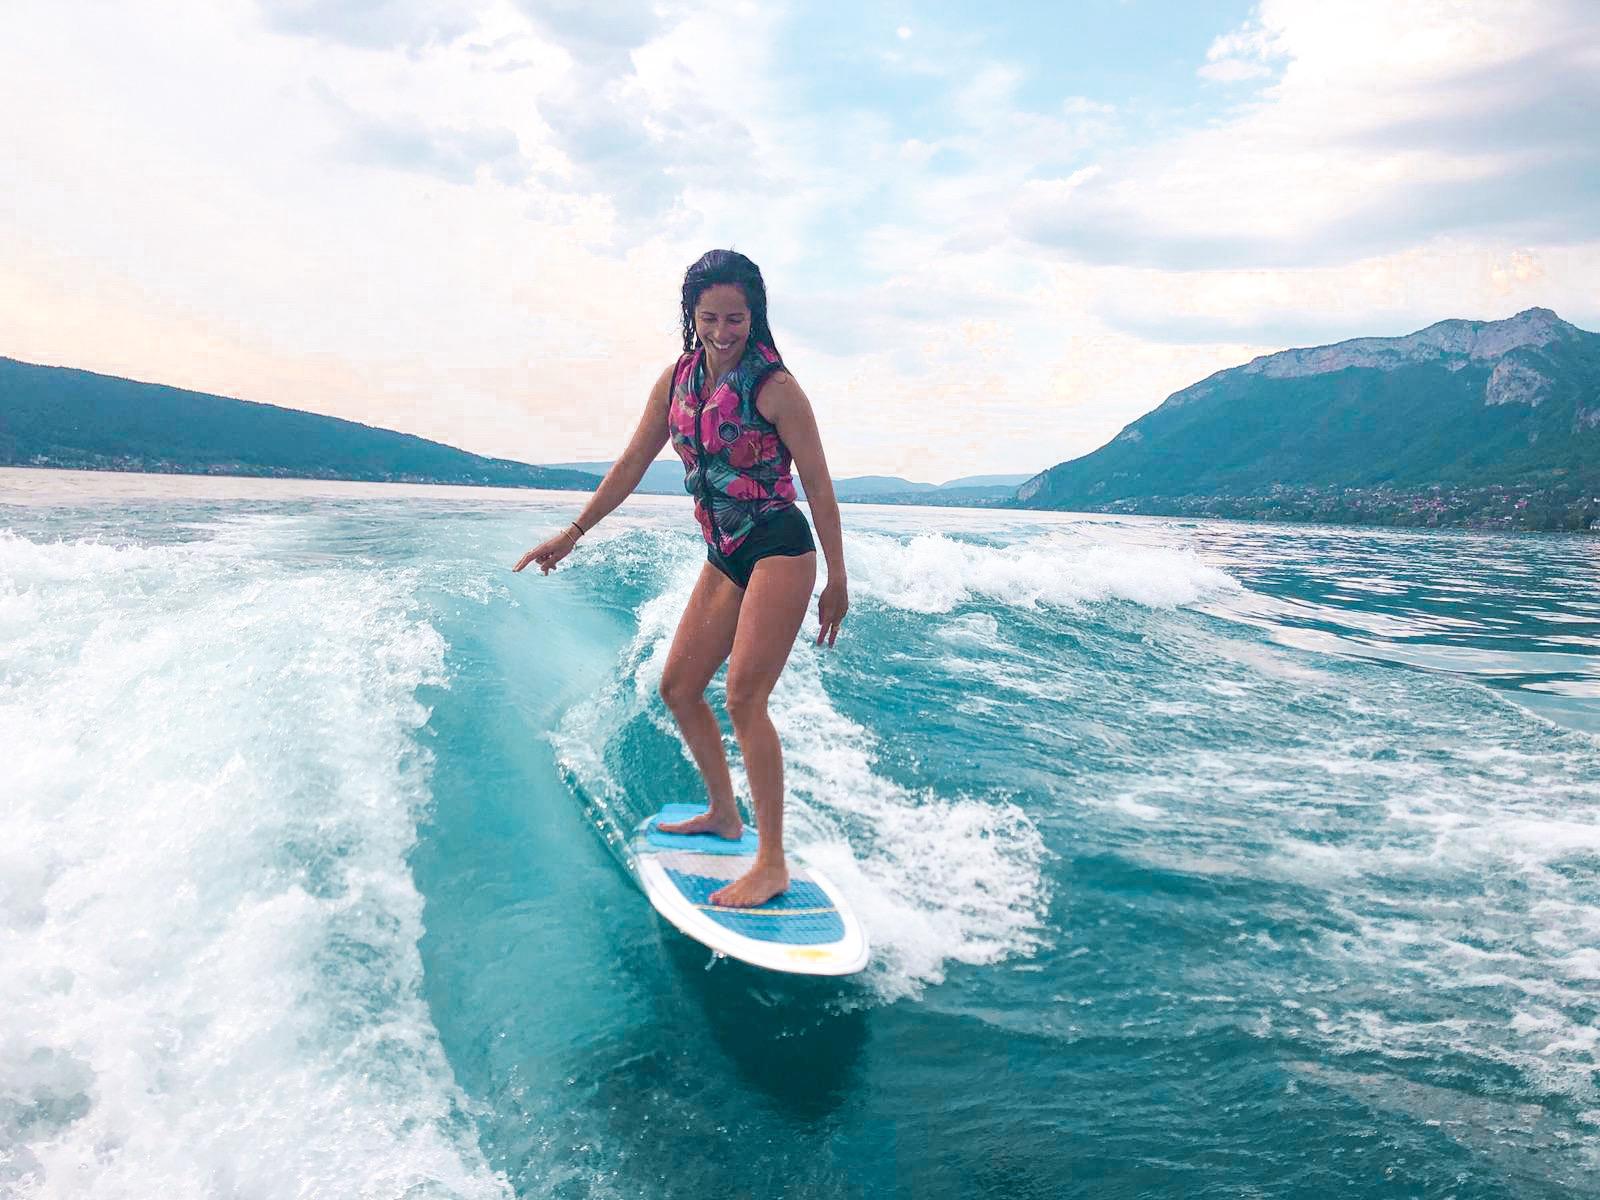 Wakesurf girl Annecy Santamila1